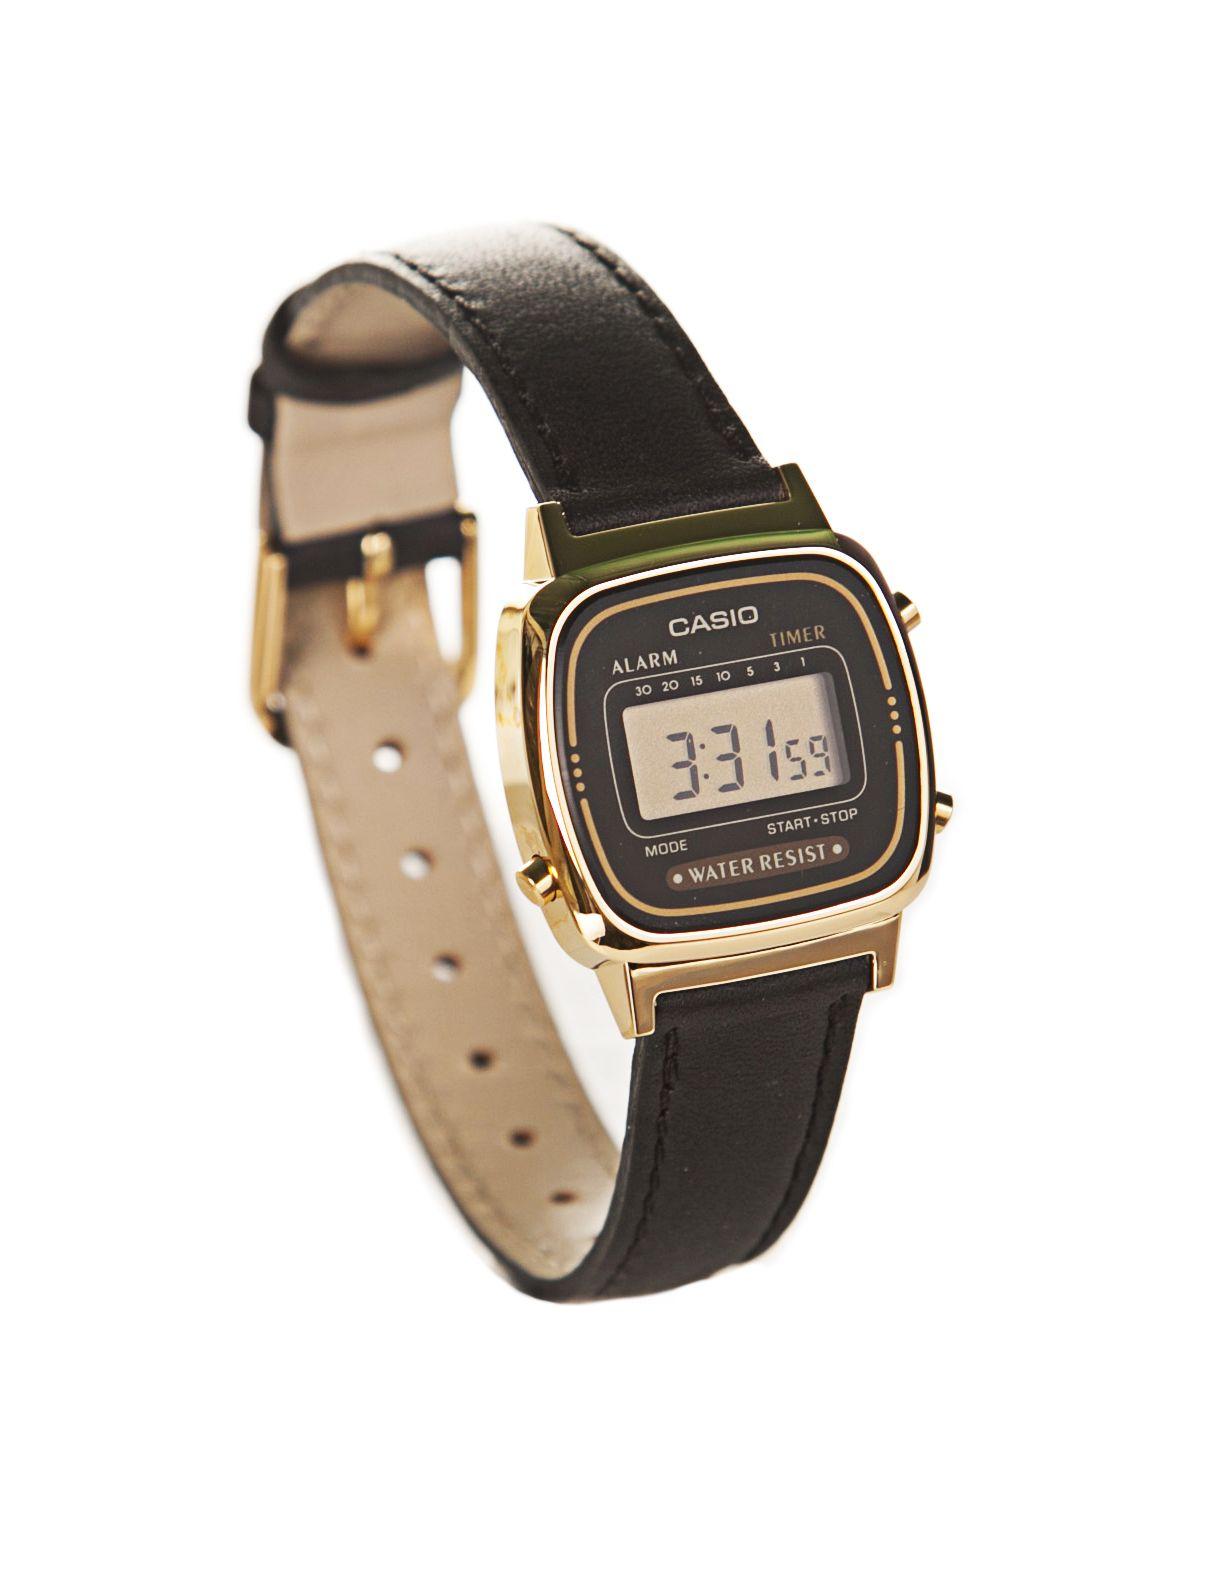 8c4531a02d70 Casio Digital Watch Black Leather Strap